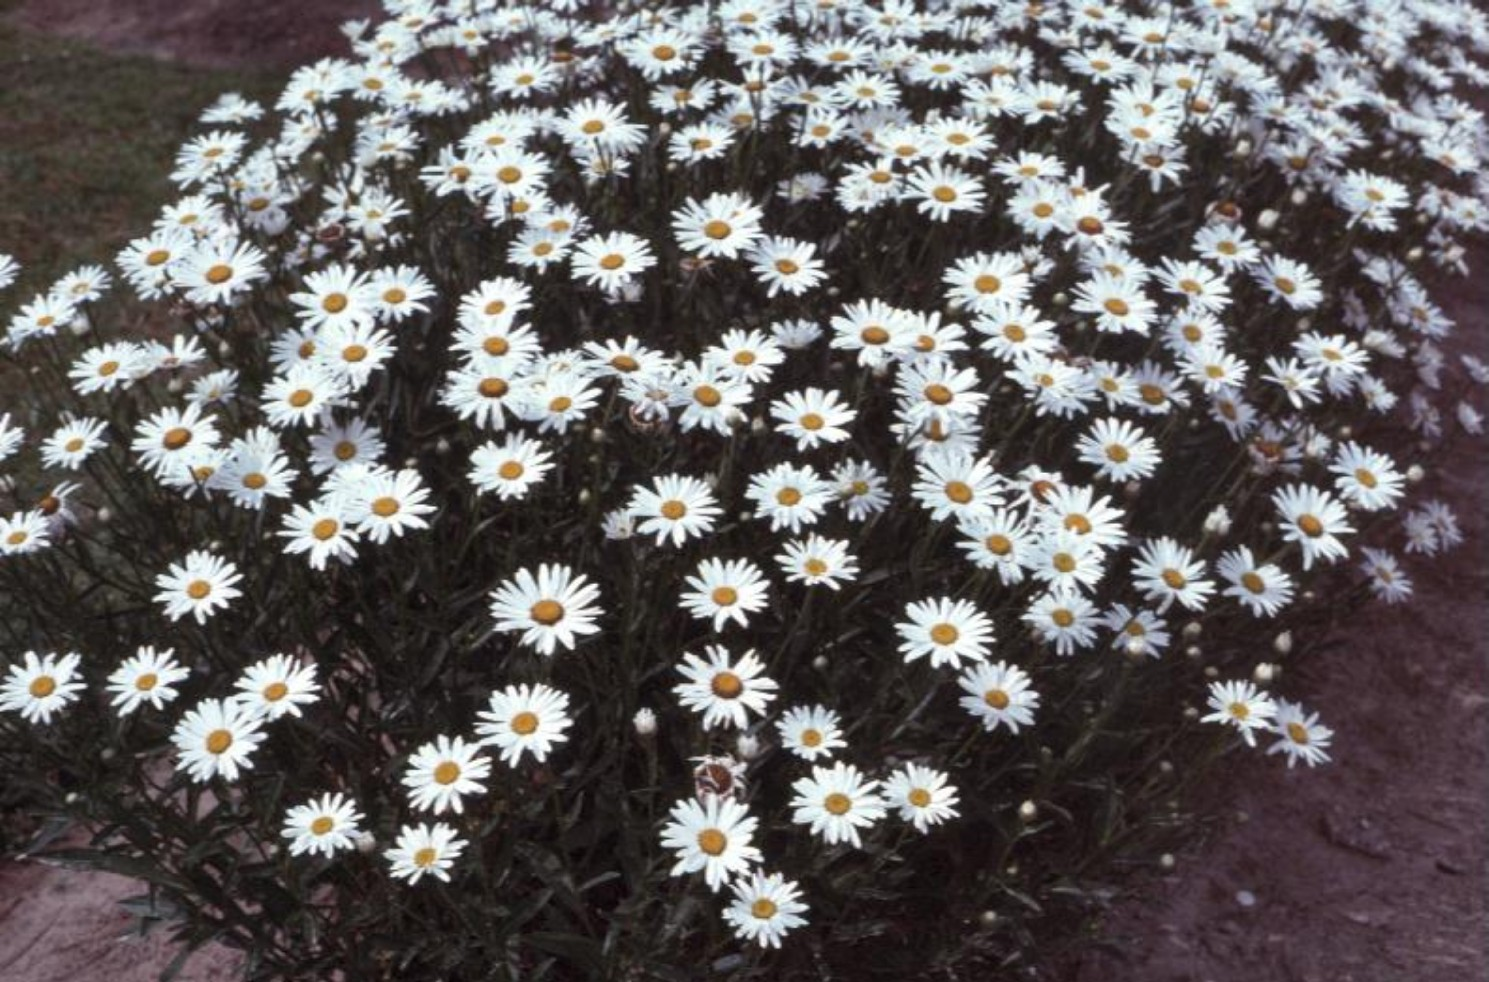 Chrysanthemum x superbum / Chrysanthemum x superbum